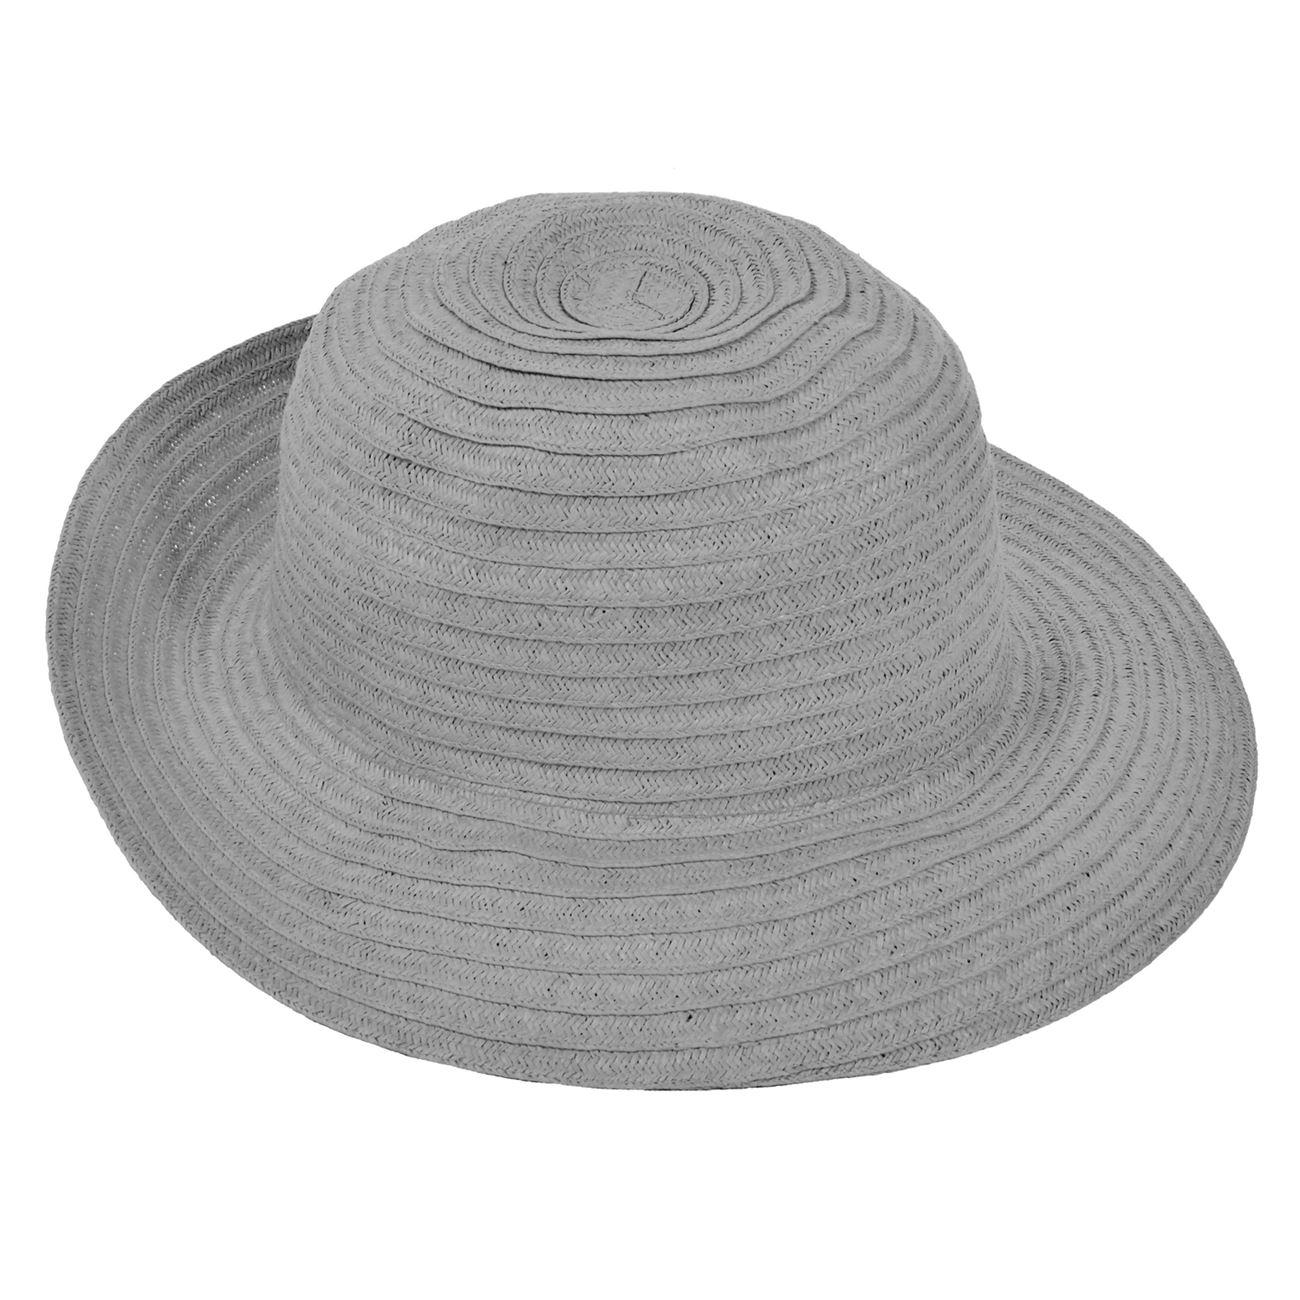 0386c56063 Καπέλο Γυναικείο Γκρι   Καπέλα Ψάθινα Γυναικεία